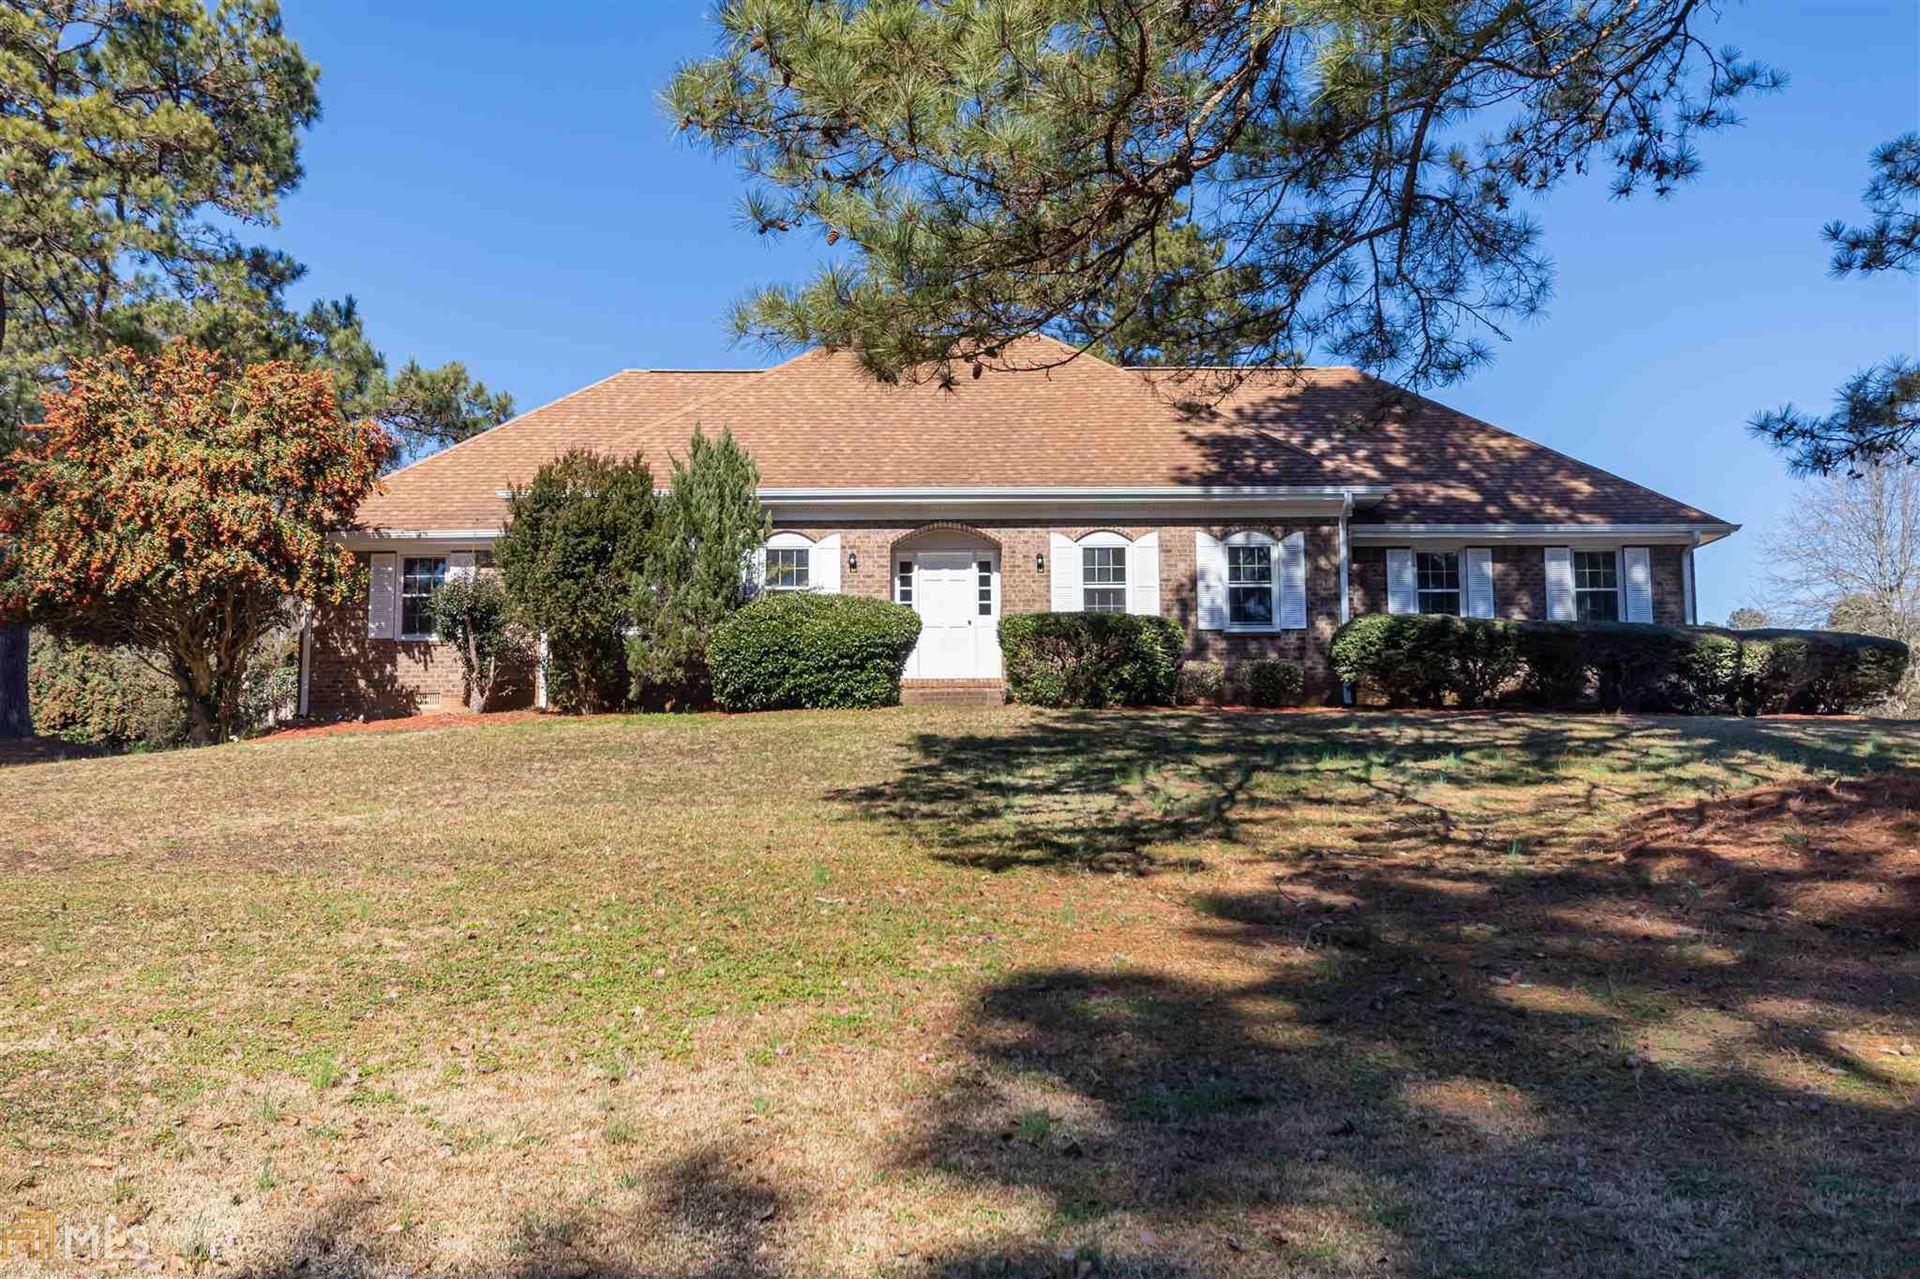 590 Hawthorne Dr, Fayetteville, GA 30214 - #: 8923699